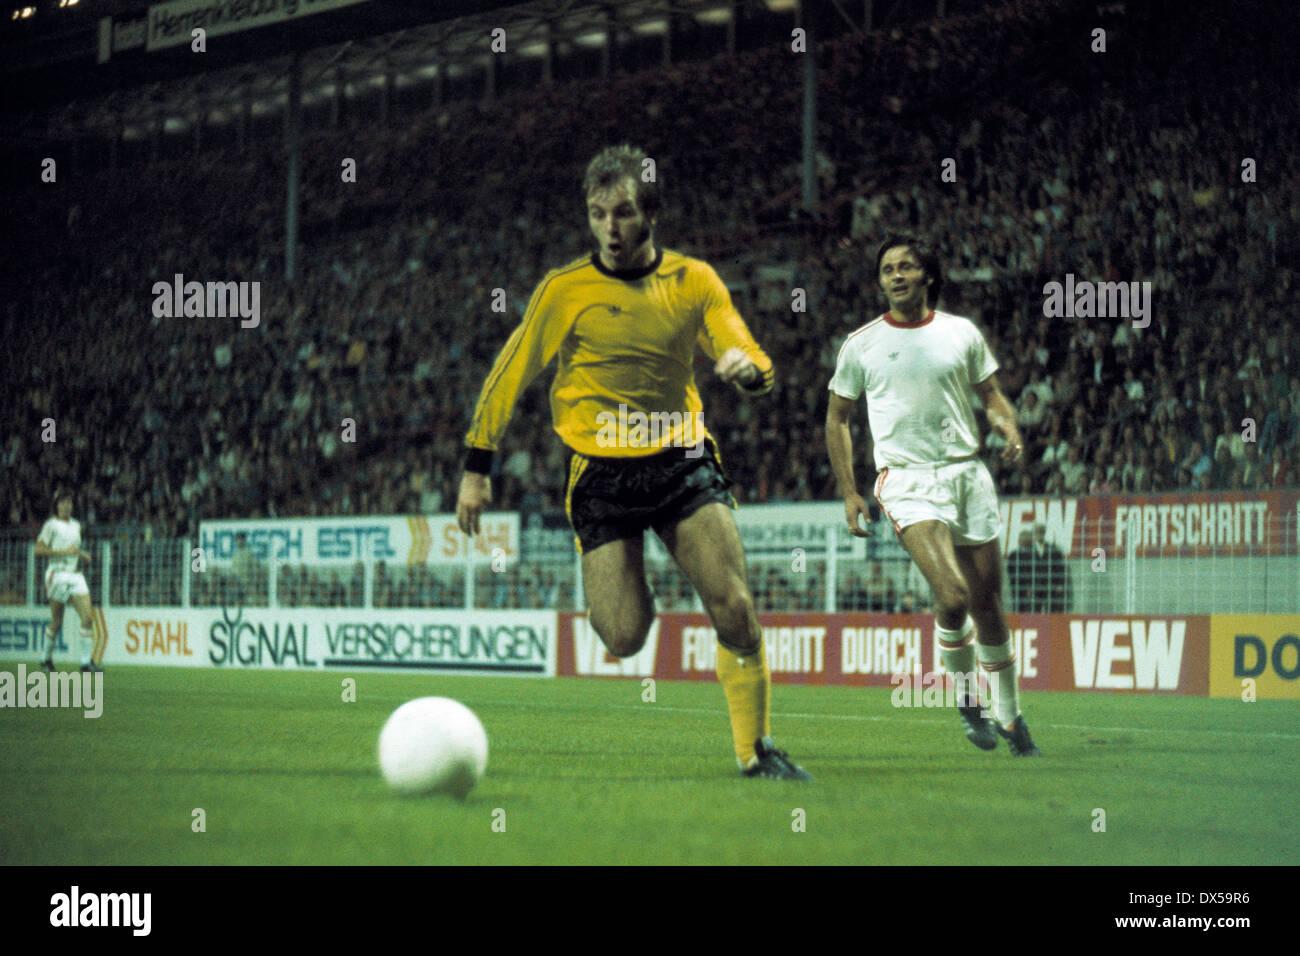 football, 2. Bundesliga Nord, 1974/1975, Westfalen Stadium, Borussia Dortmund versus Rot Weiss Oberhausen 4:0, scene of the match, ahead Hans-Werner Hartl (BVB), behind Dragan Stojanovic (RWO) - Stock Image